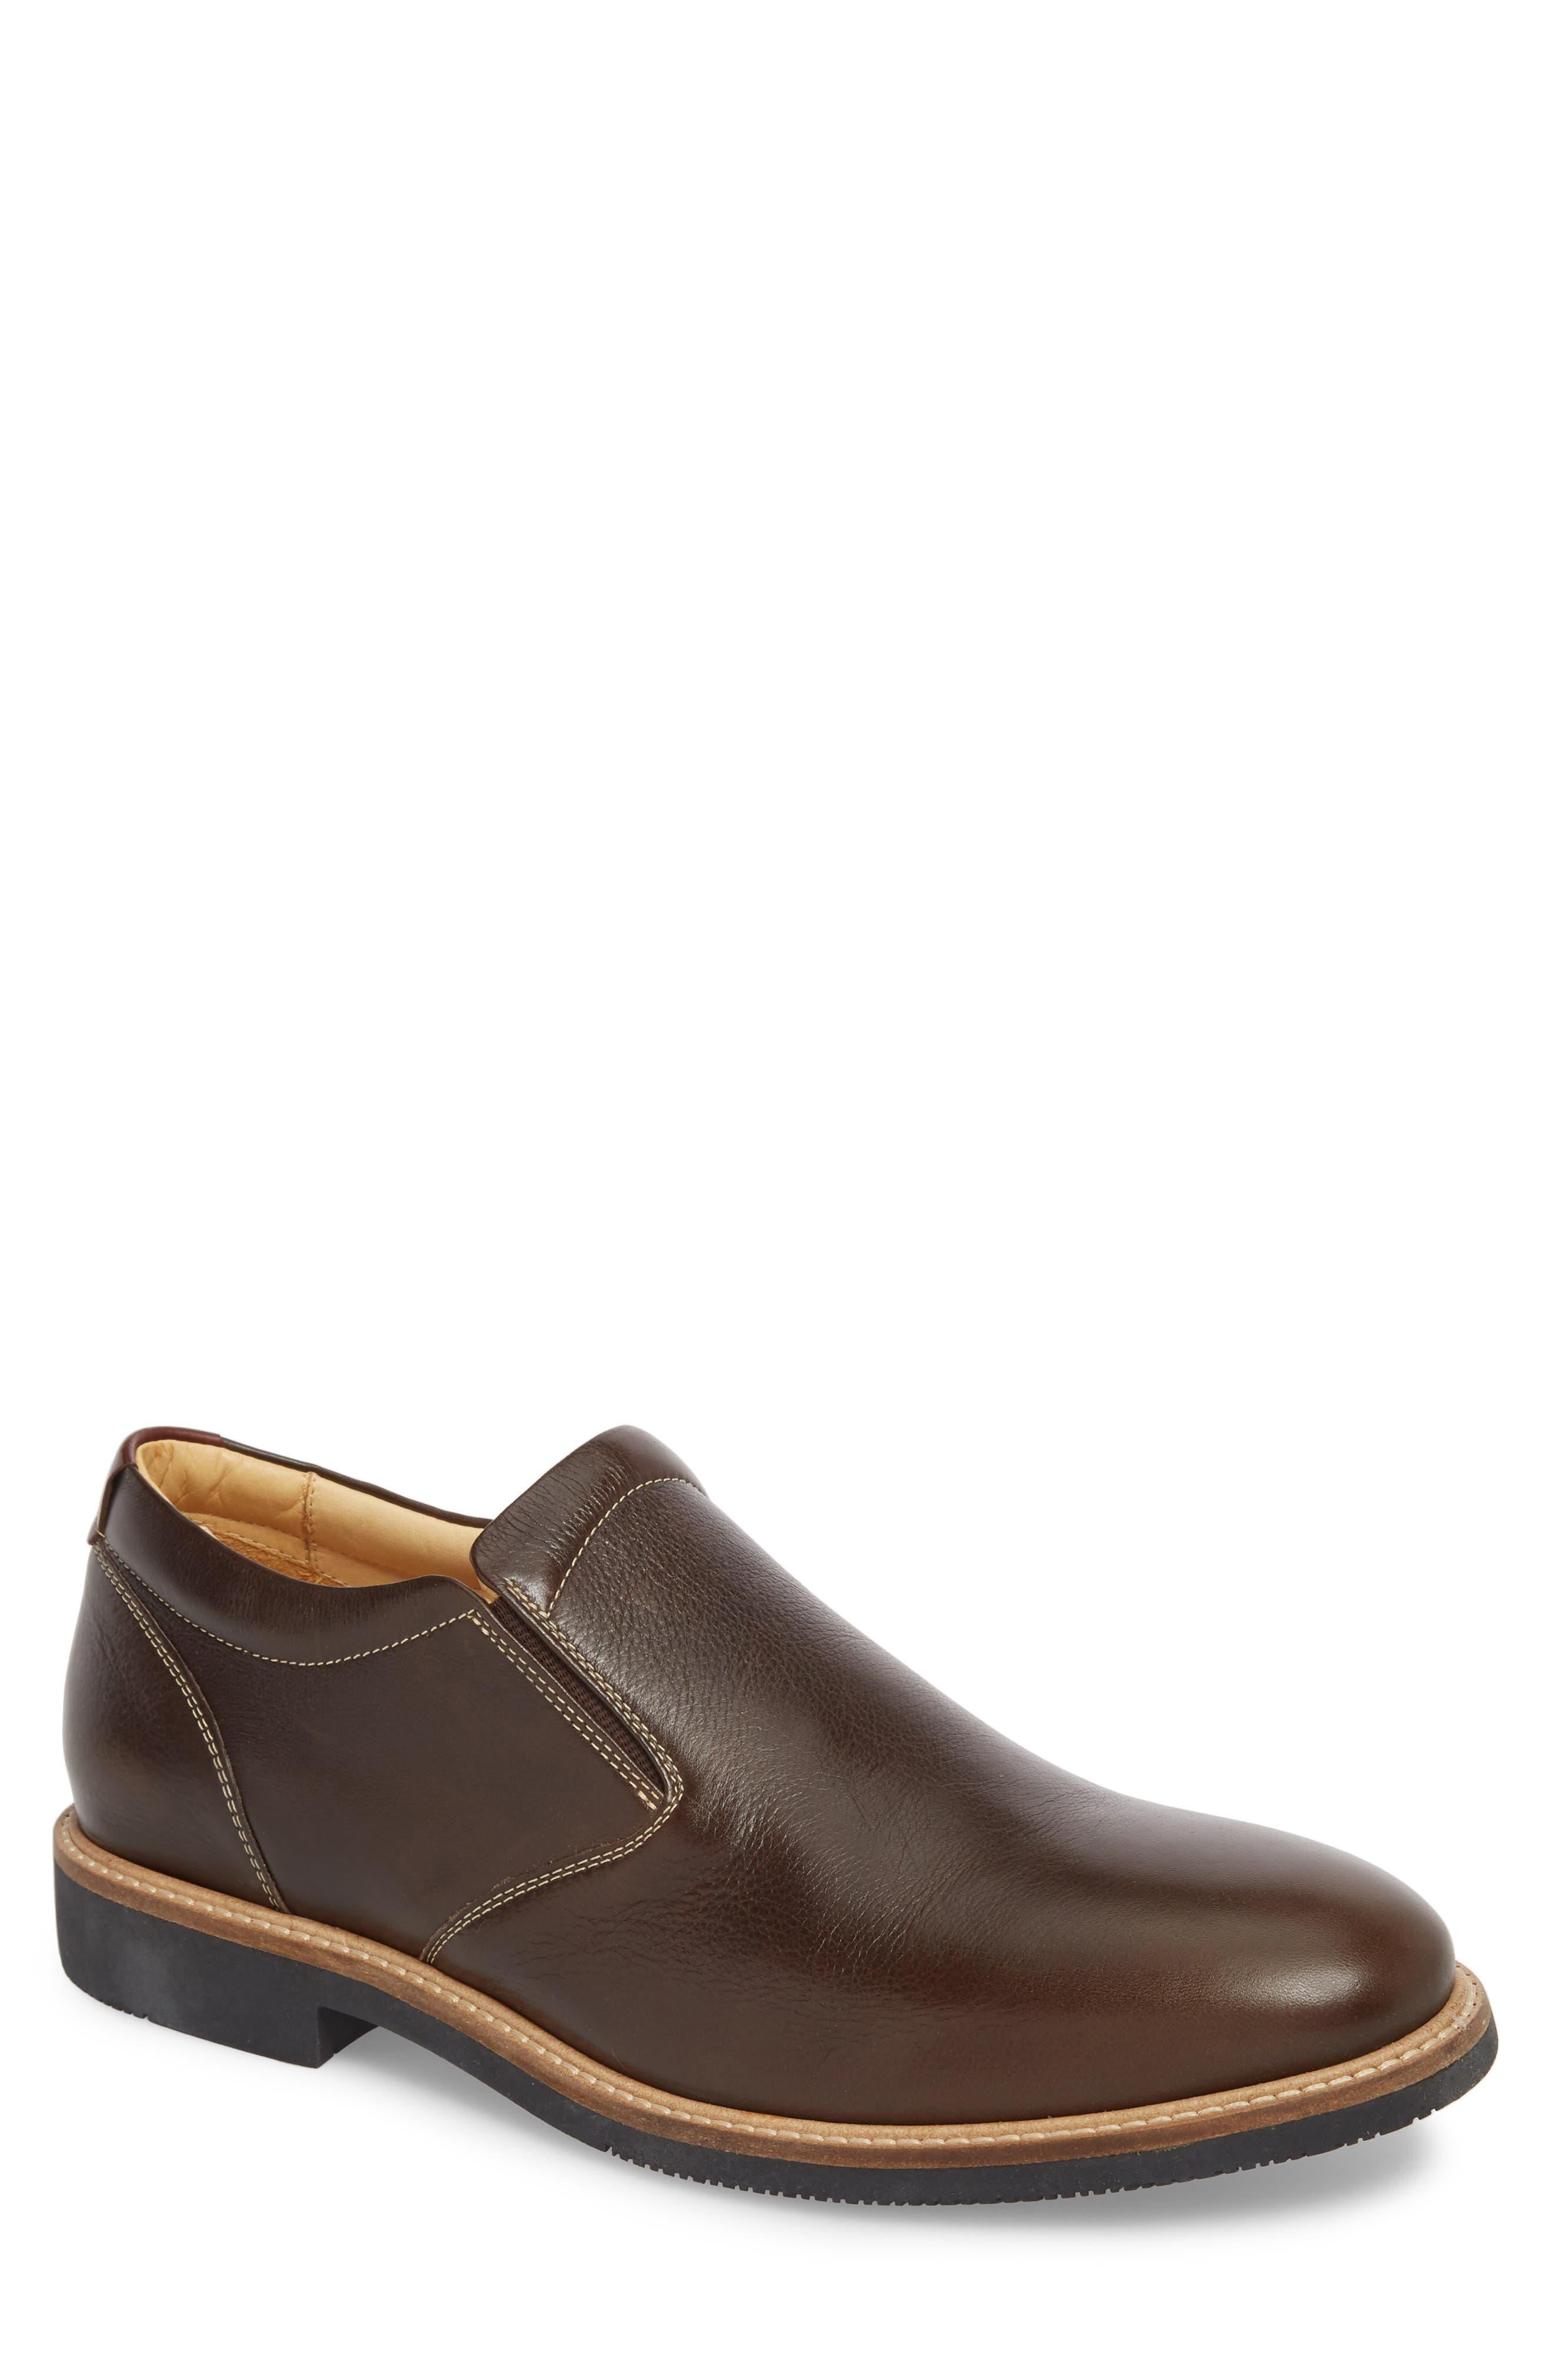 Barlow Plain Toe Slip-On,                         Main,                         color, Dark Brown Leather